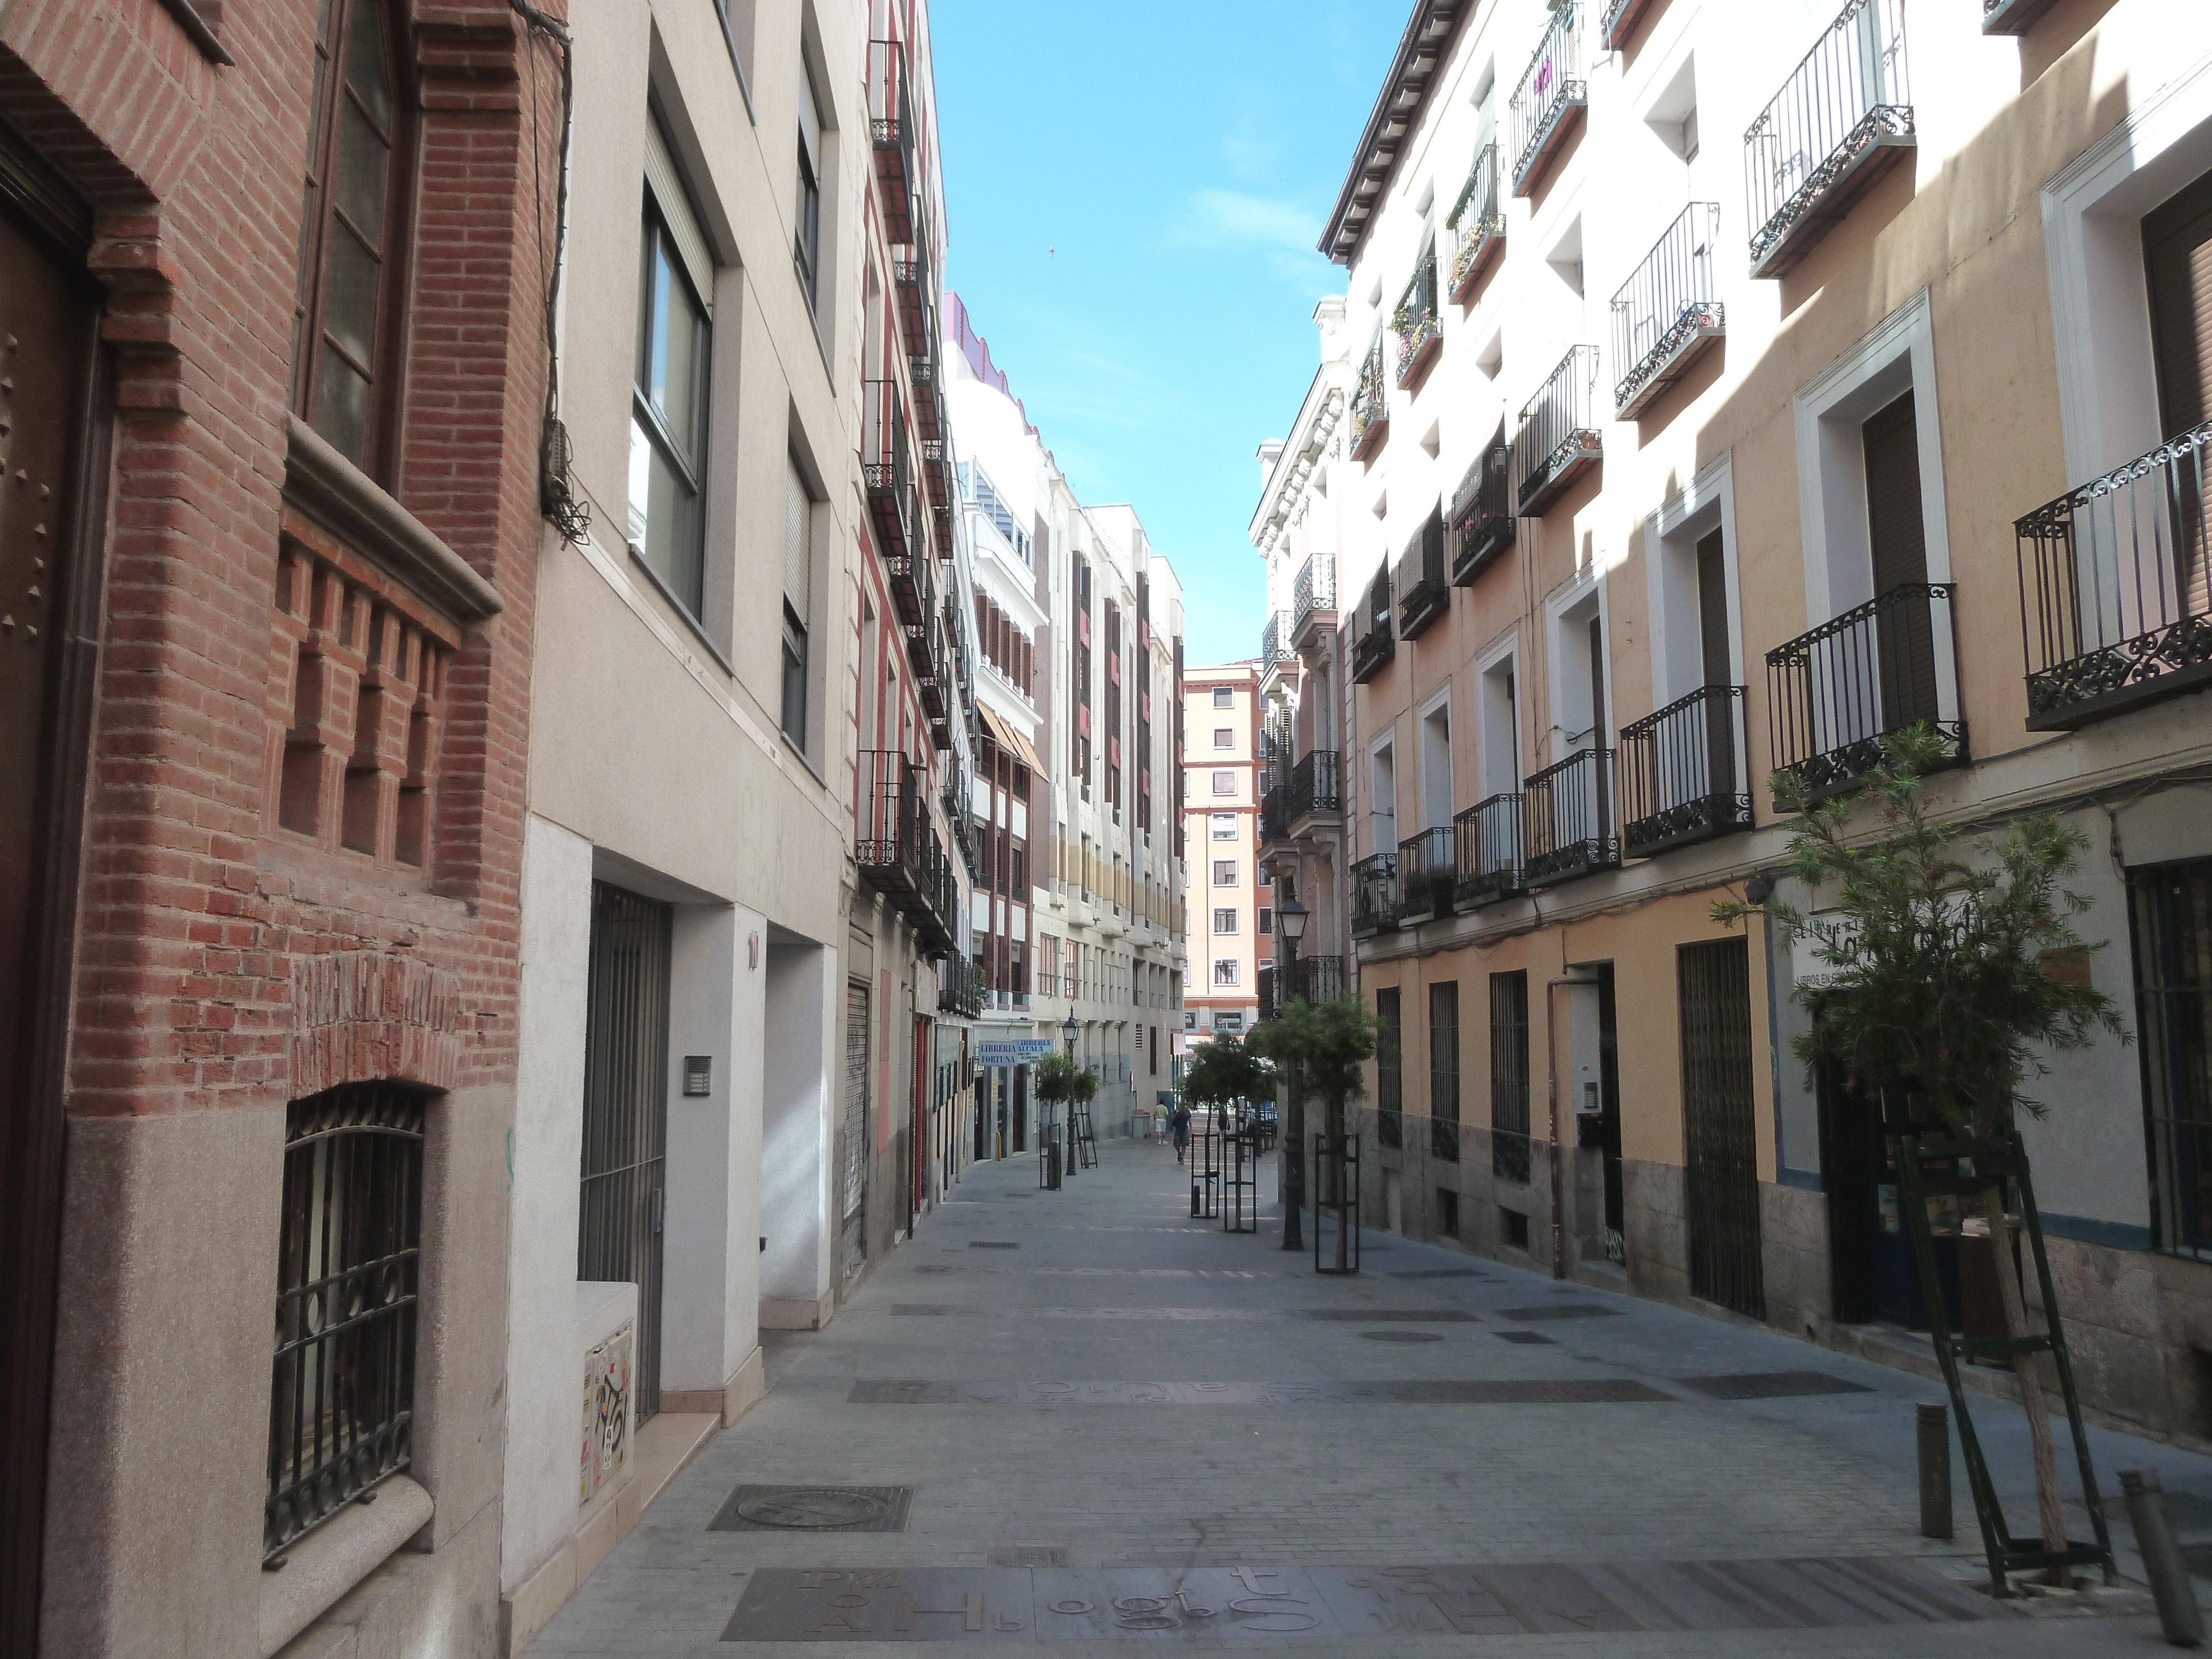 Archivo calle de los libreros madrid wikipedia - H m calle orense madrid ...